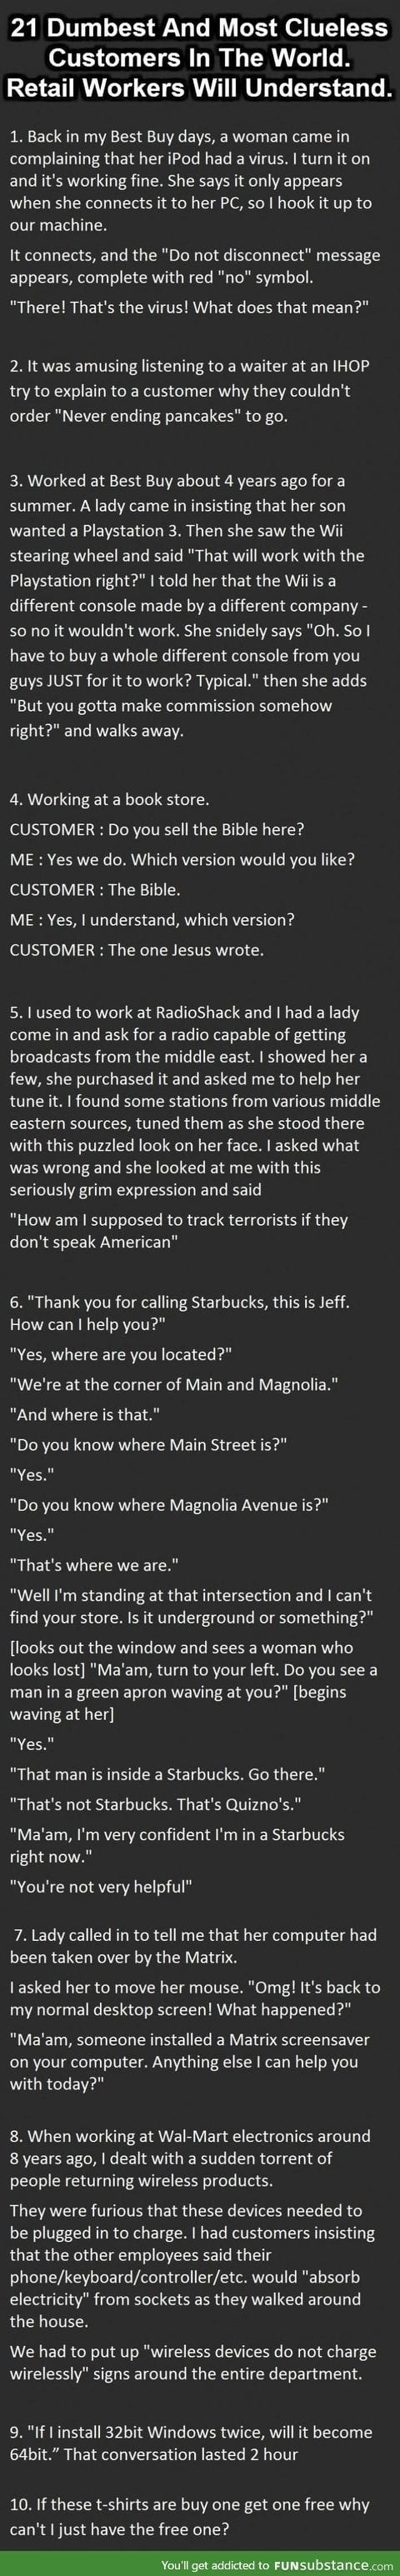 Insane customers